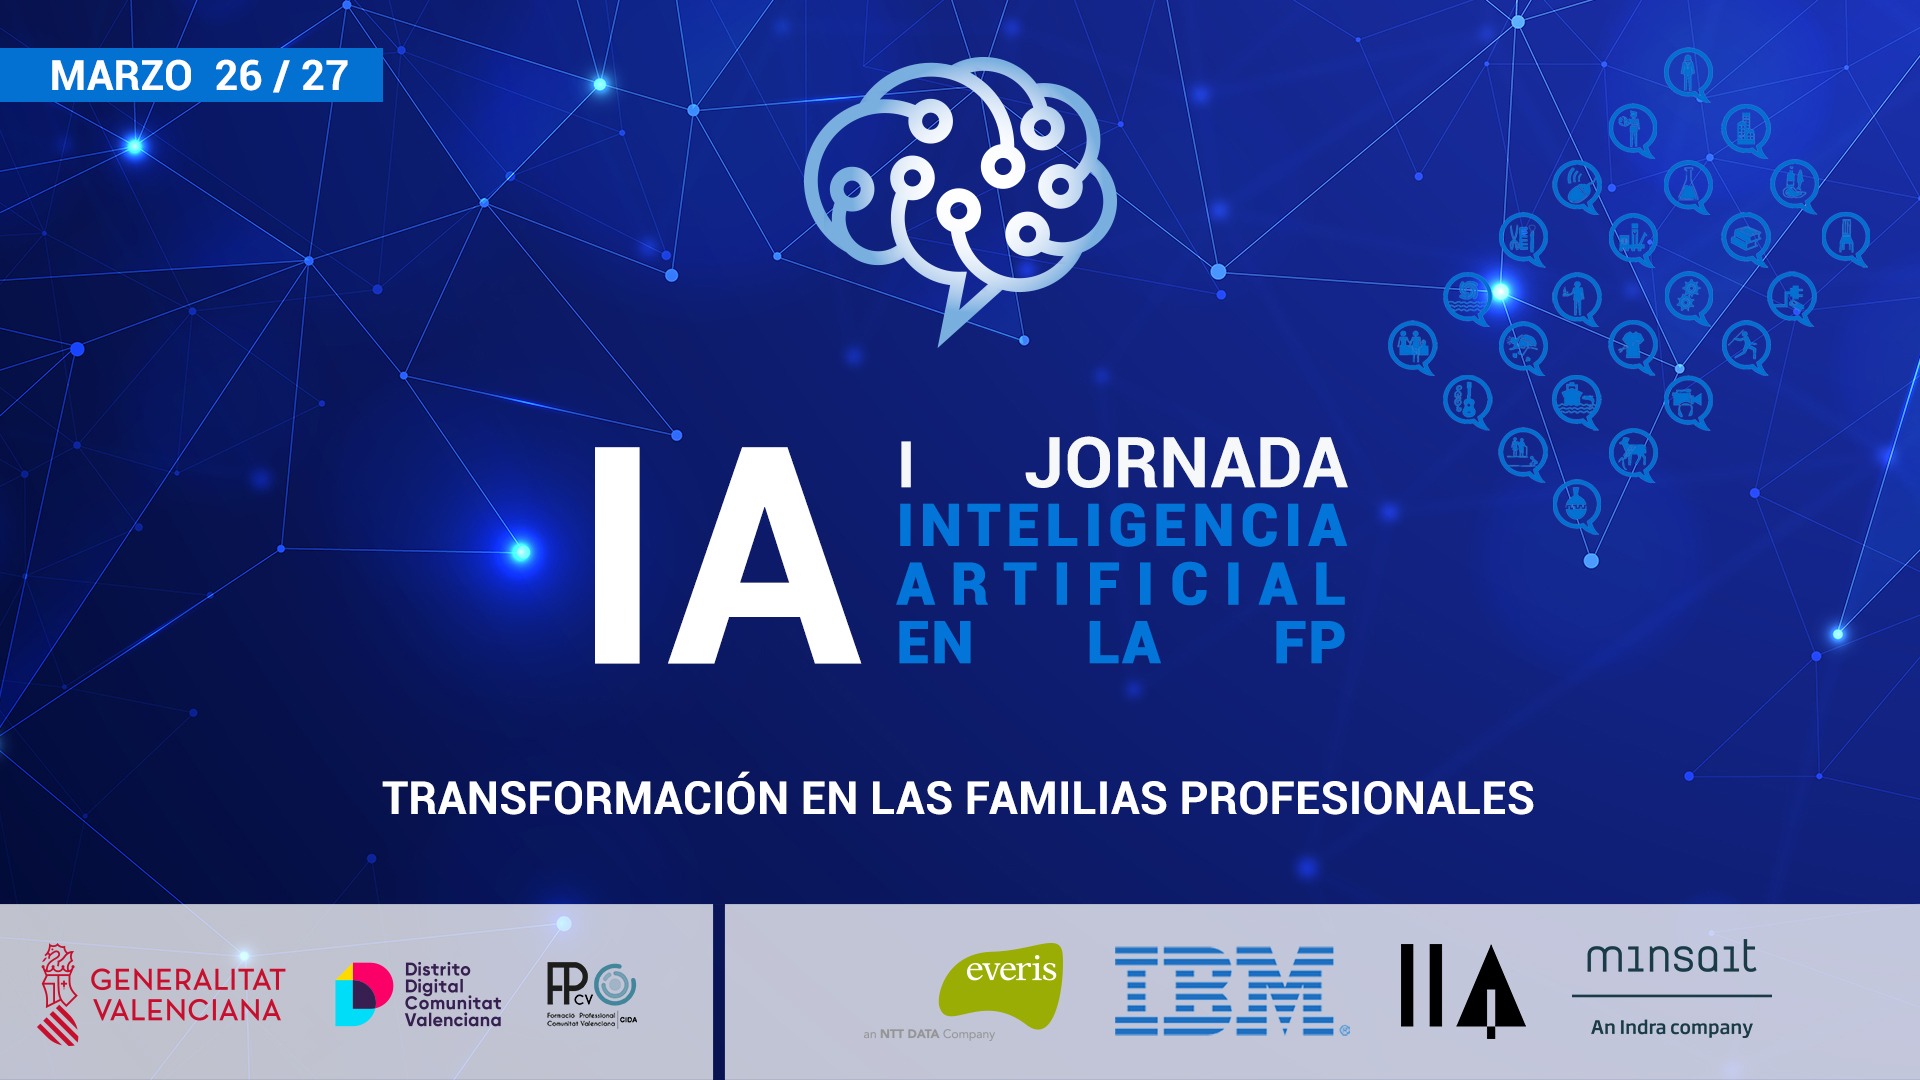 Jornada-Inteligencia-Artificial-FP